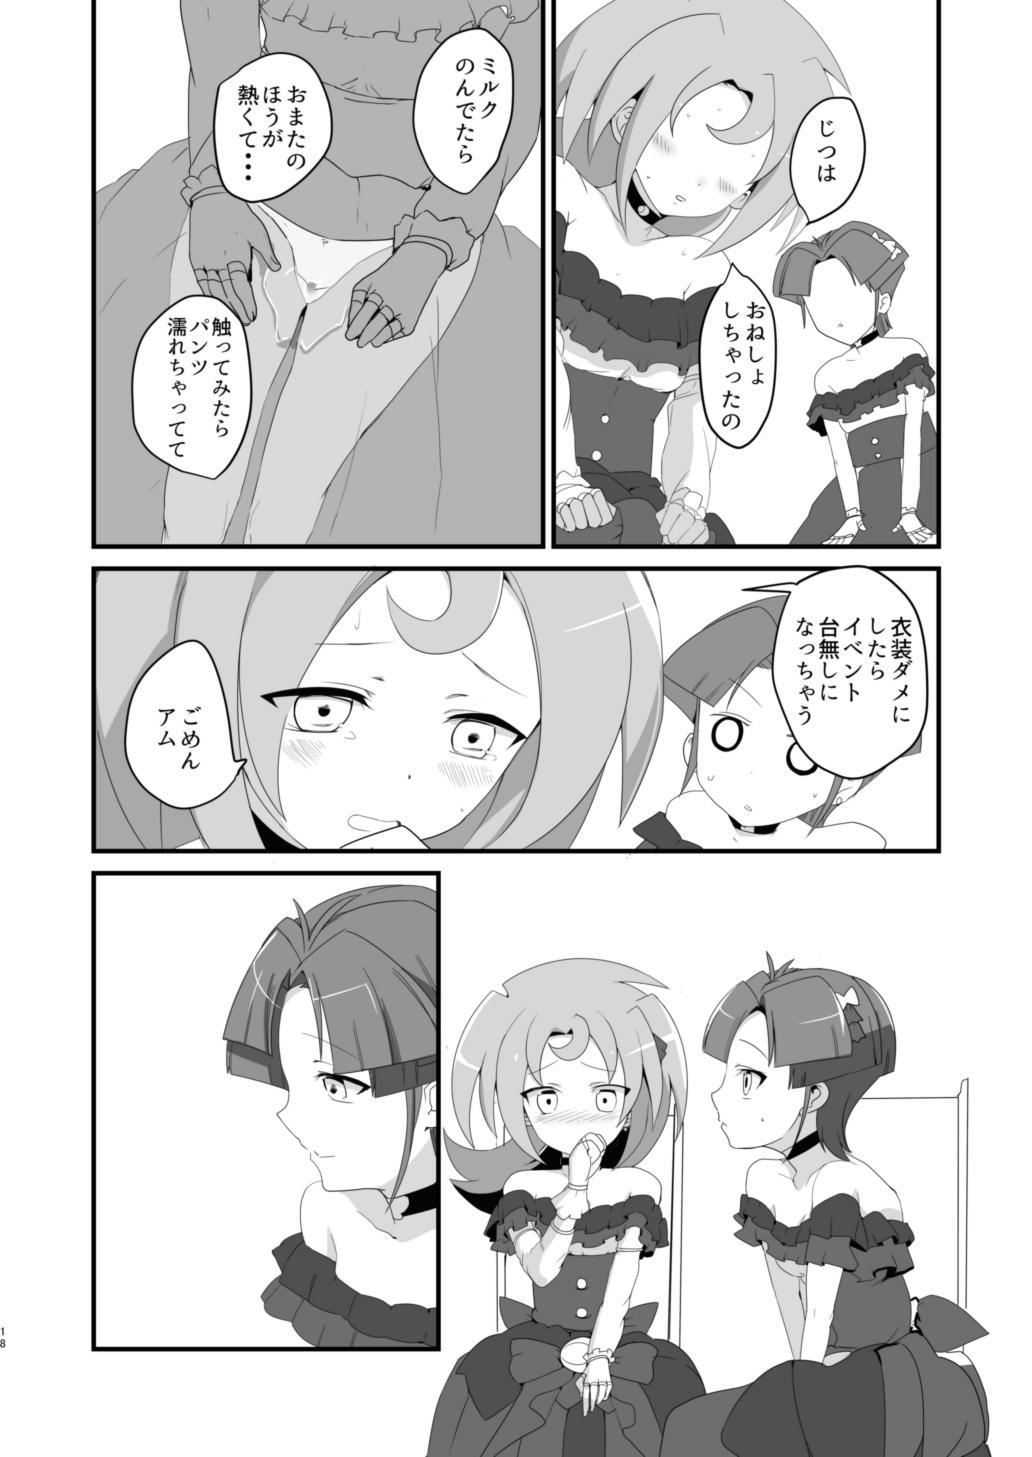 LunaAm O♂n♂n Akushuukai 16